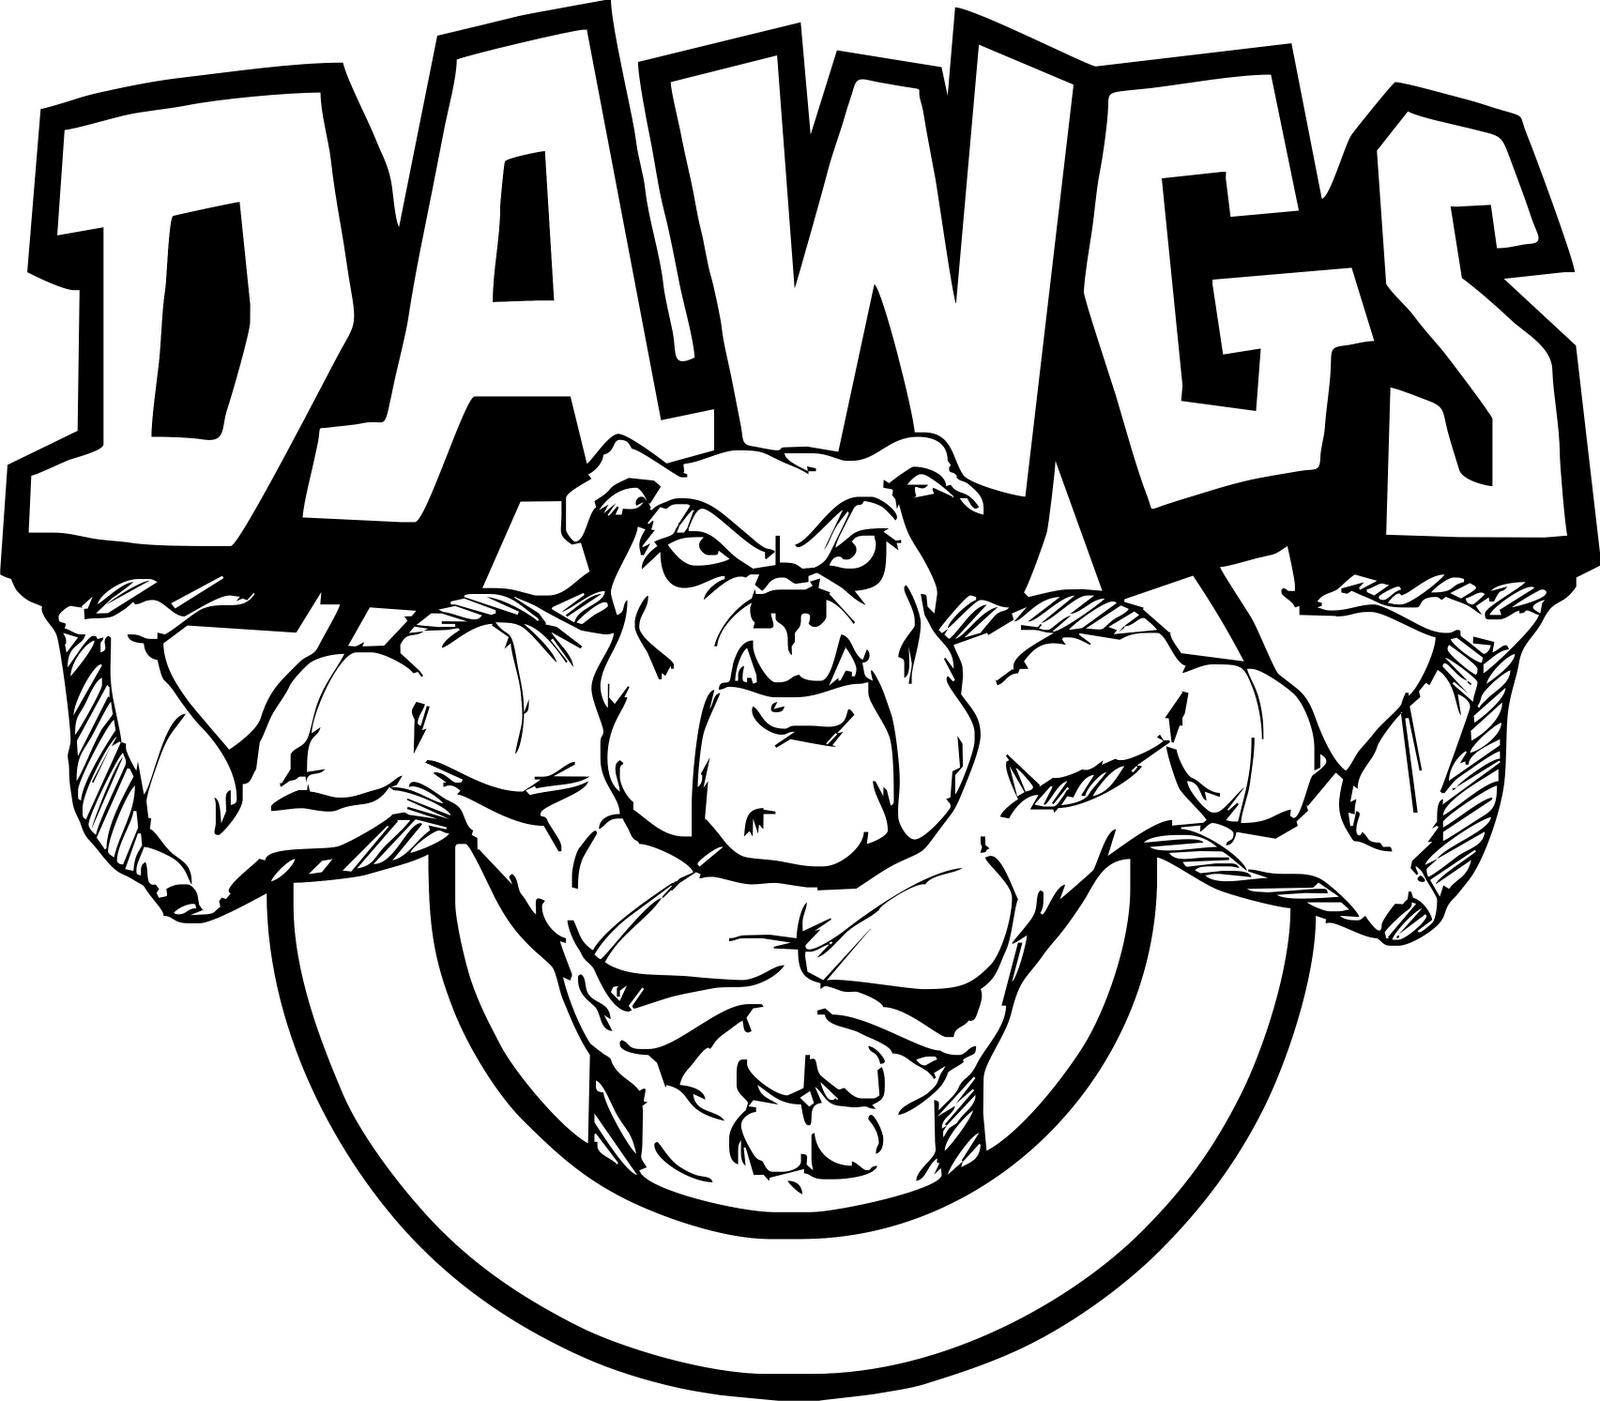 bulldog CLIP ART MASDG001 CC DAWGS Pinterest